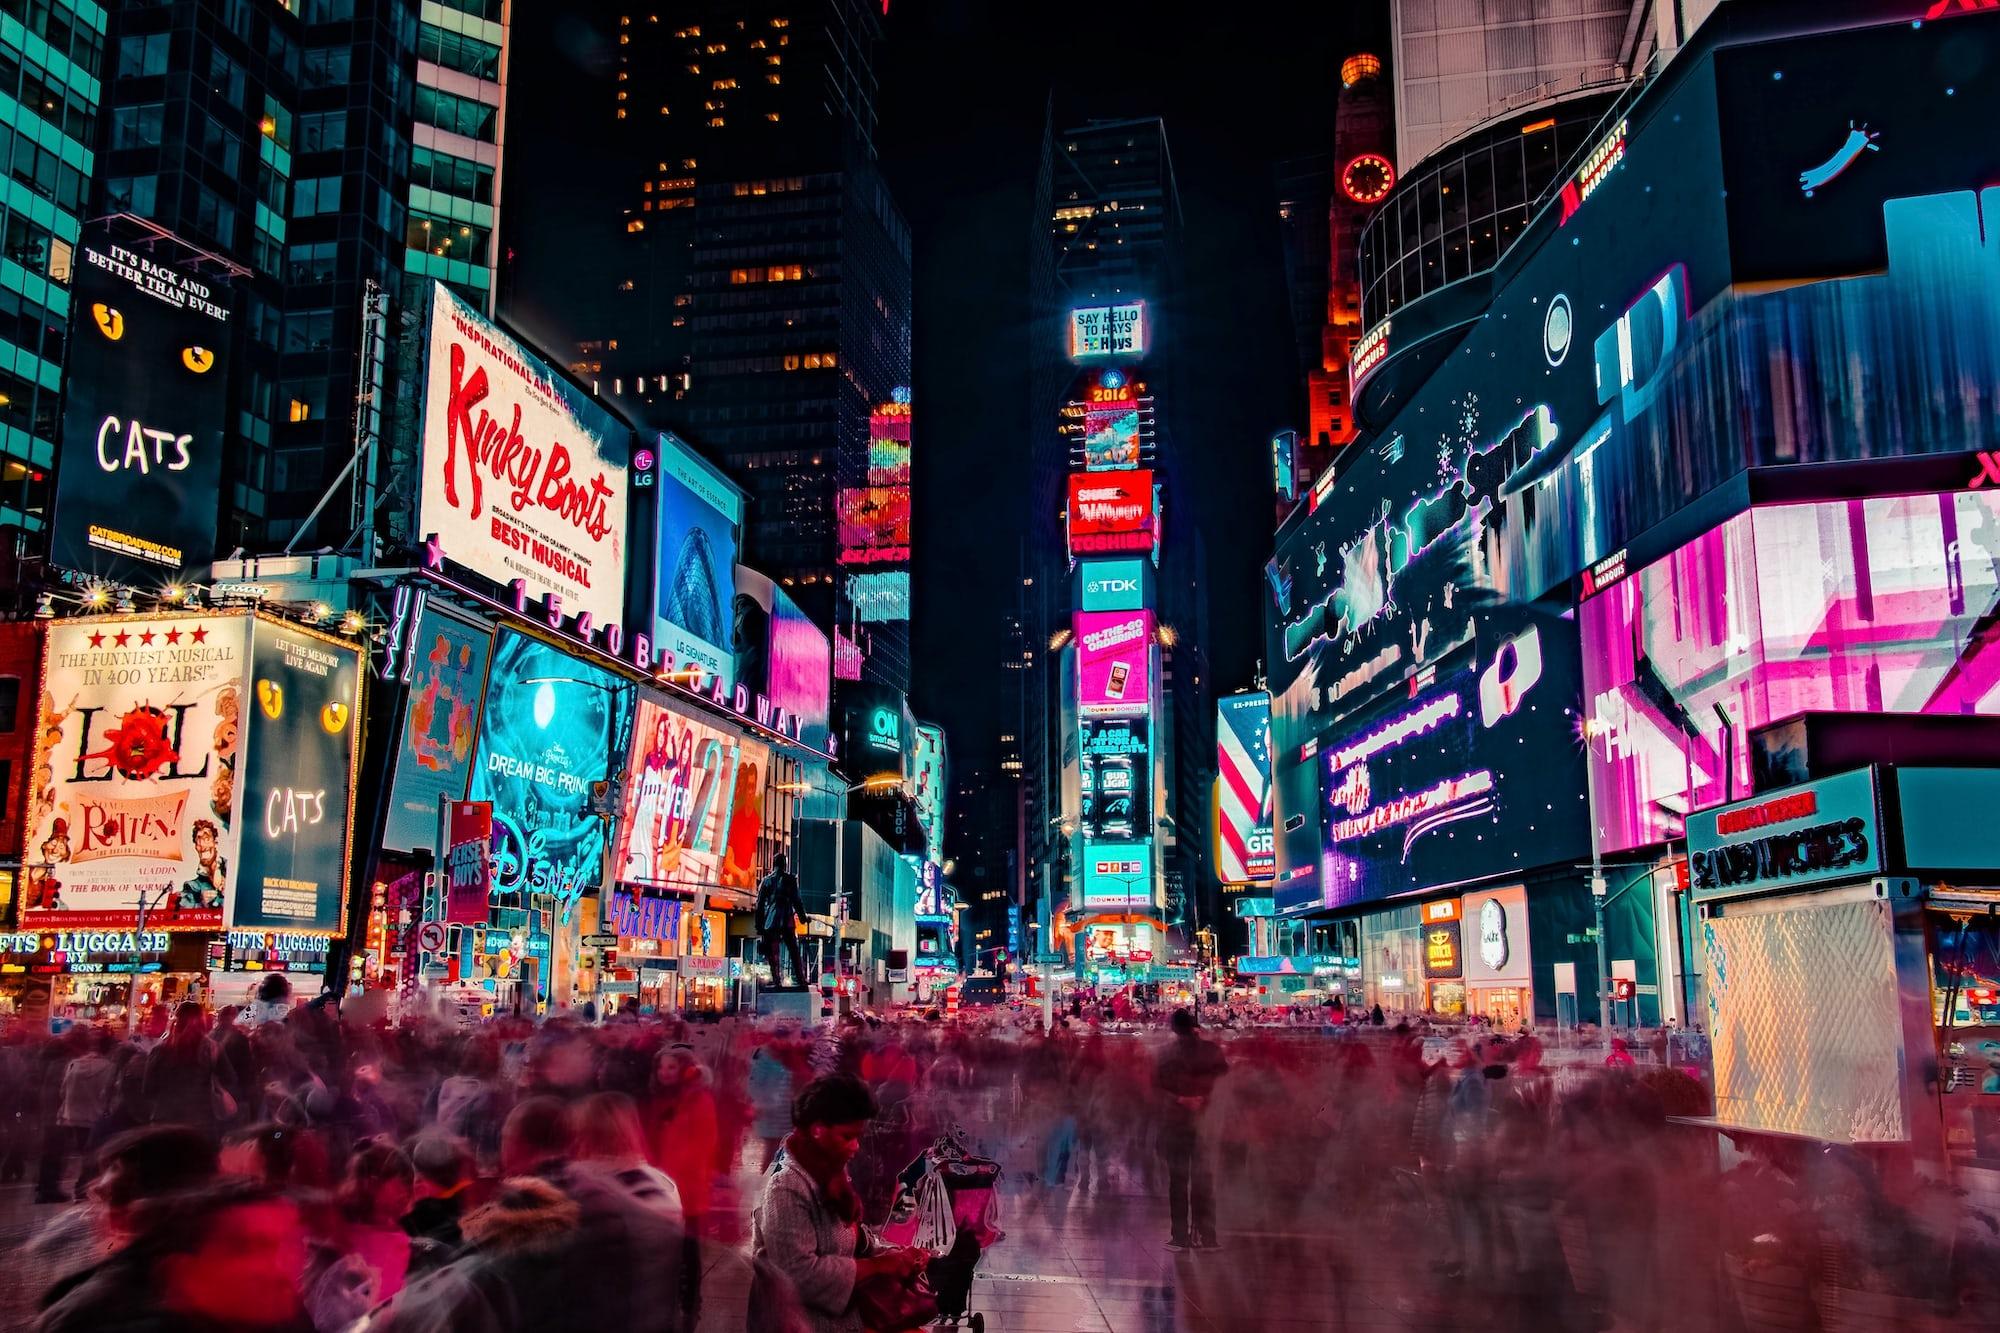 Нью йорк яркие картинки